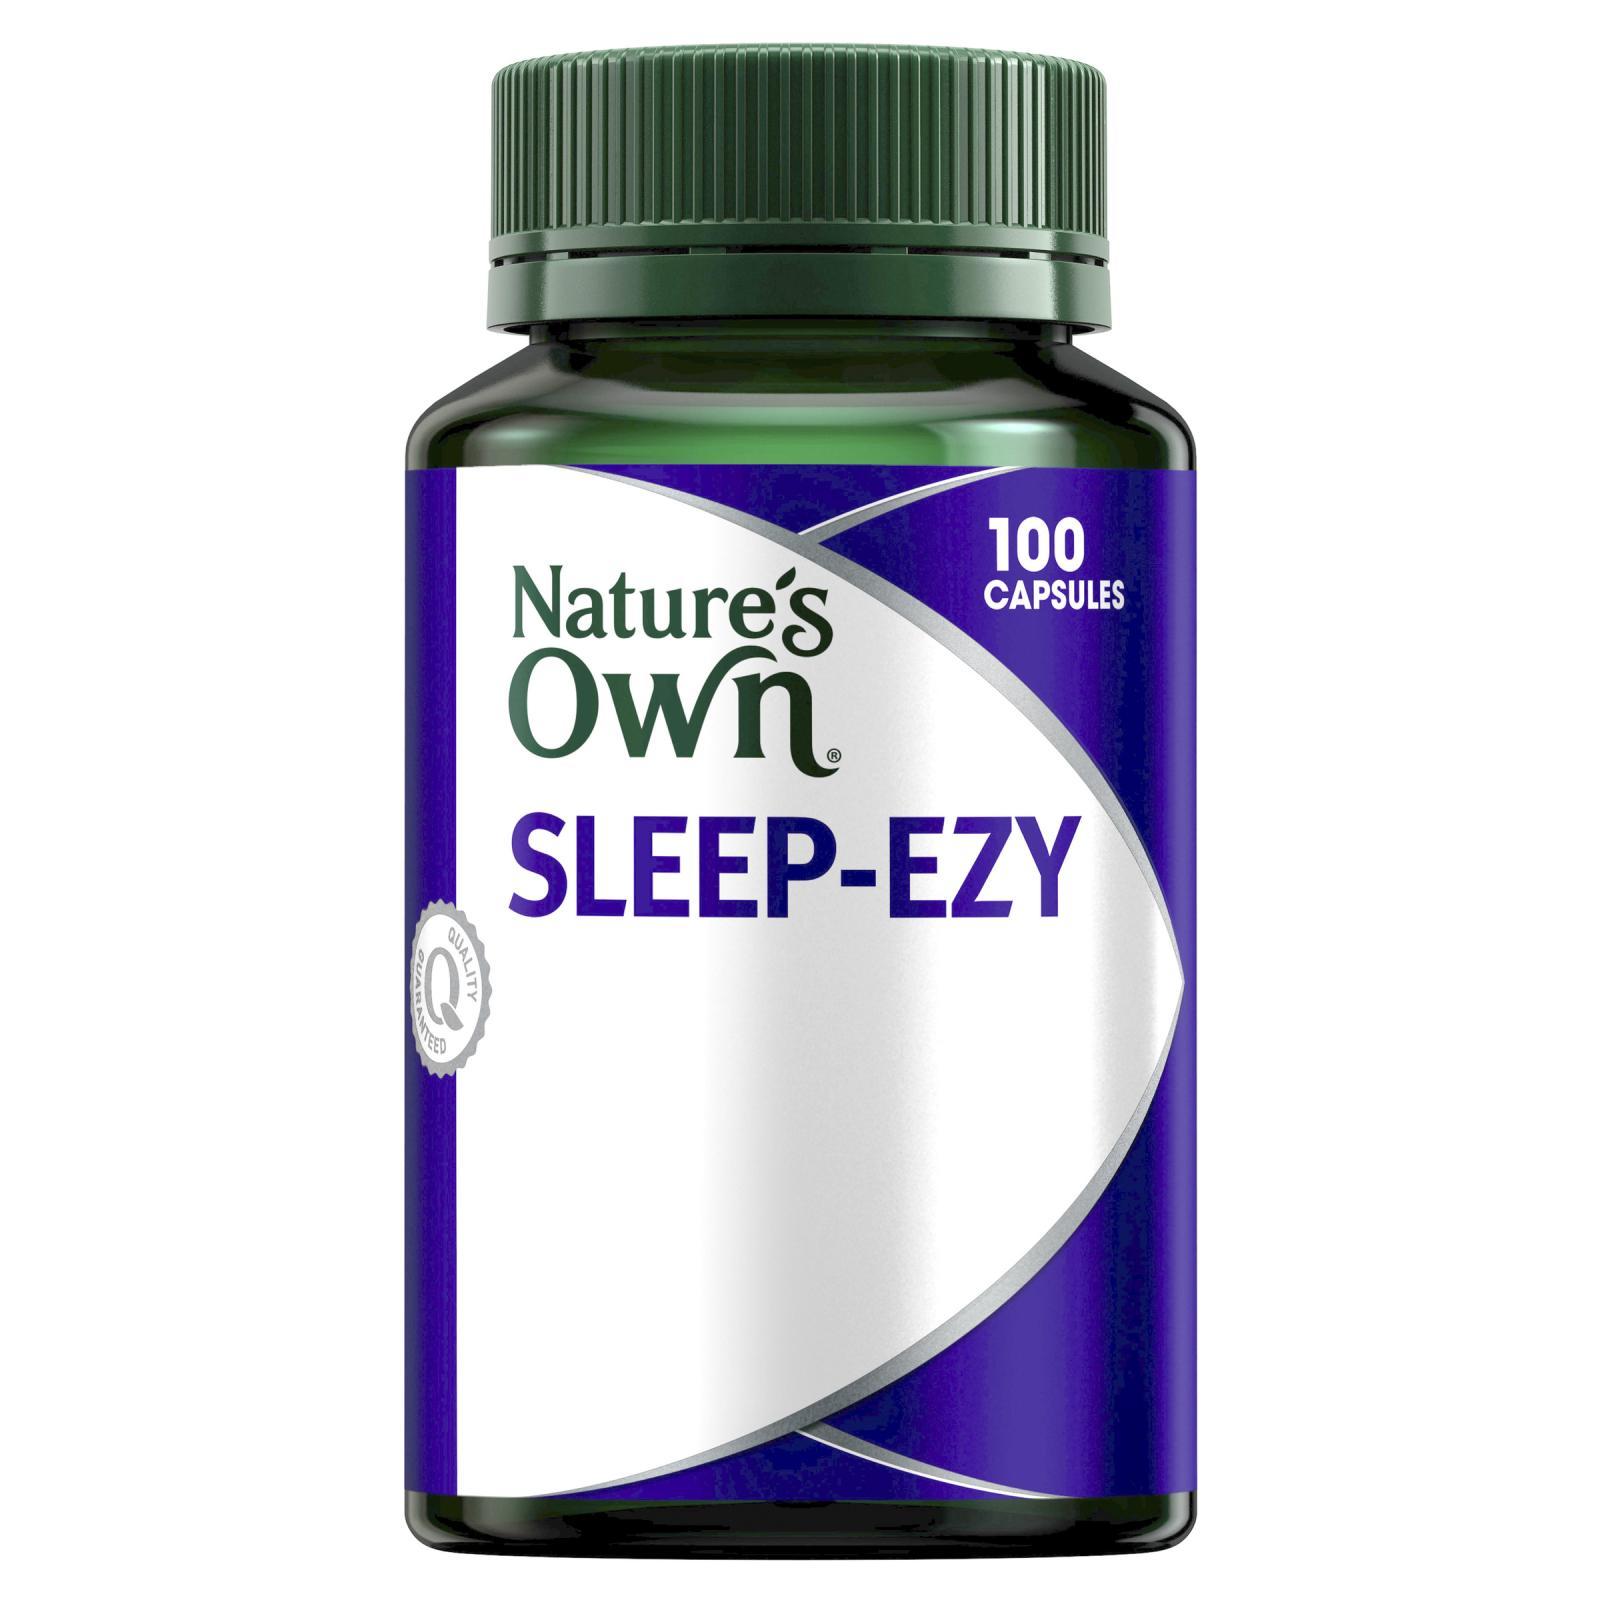 Natures Own Sleep Ezy Capsules 100